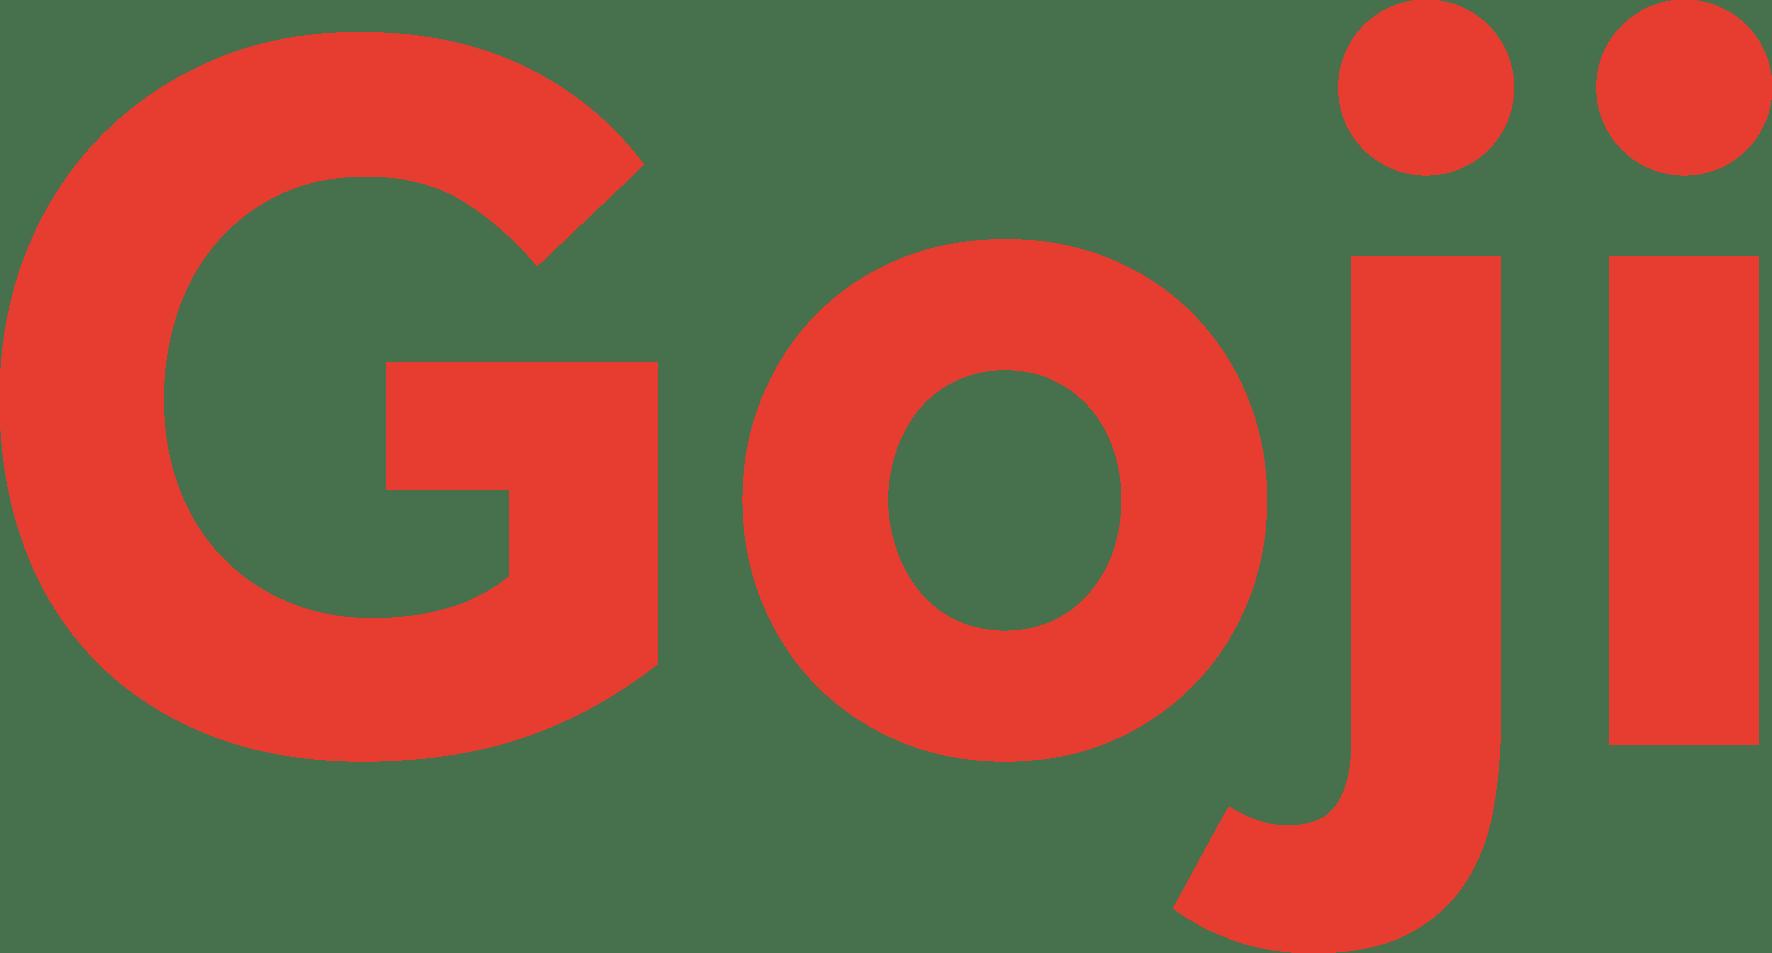 Goji Logo